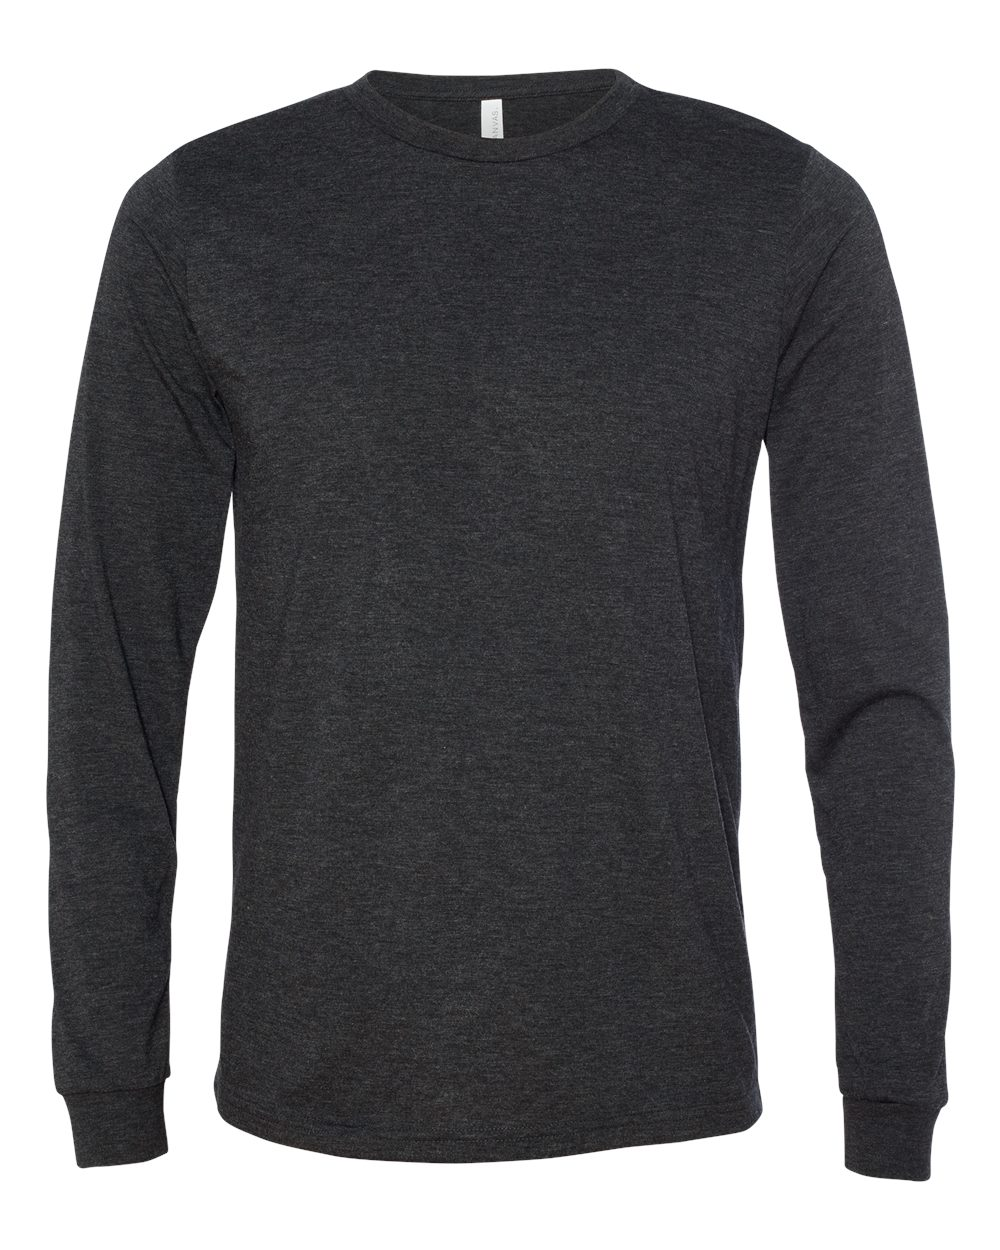 Bella-Canvas-Mens-Blank-Top-Long-Sleeve-Jersey-Tee-T-Shirt-3501-up-to-3XL thumbnail 33